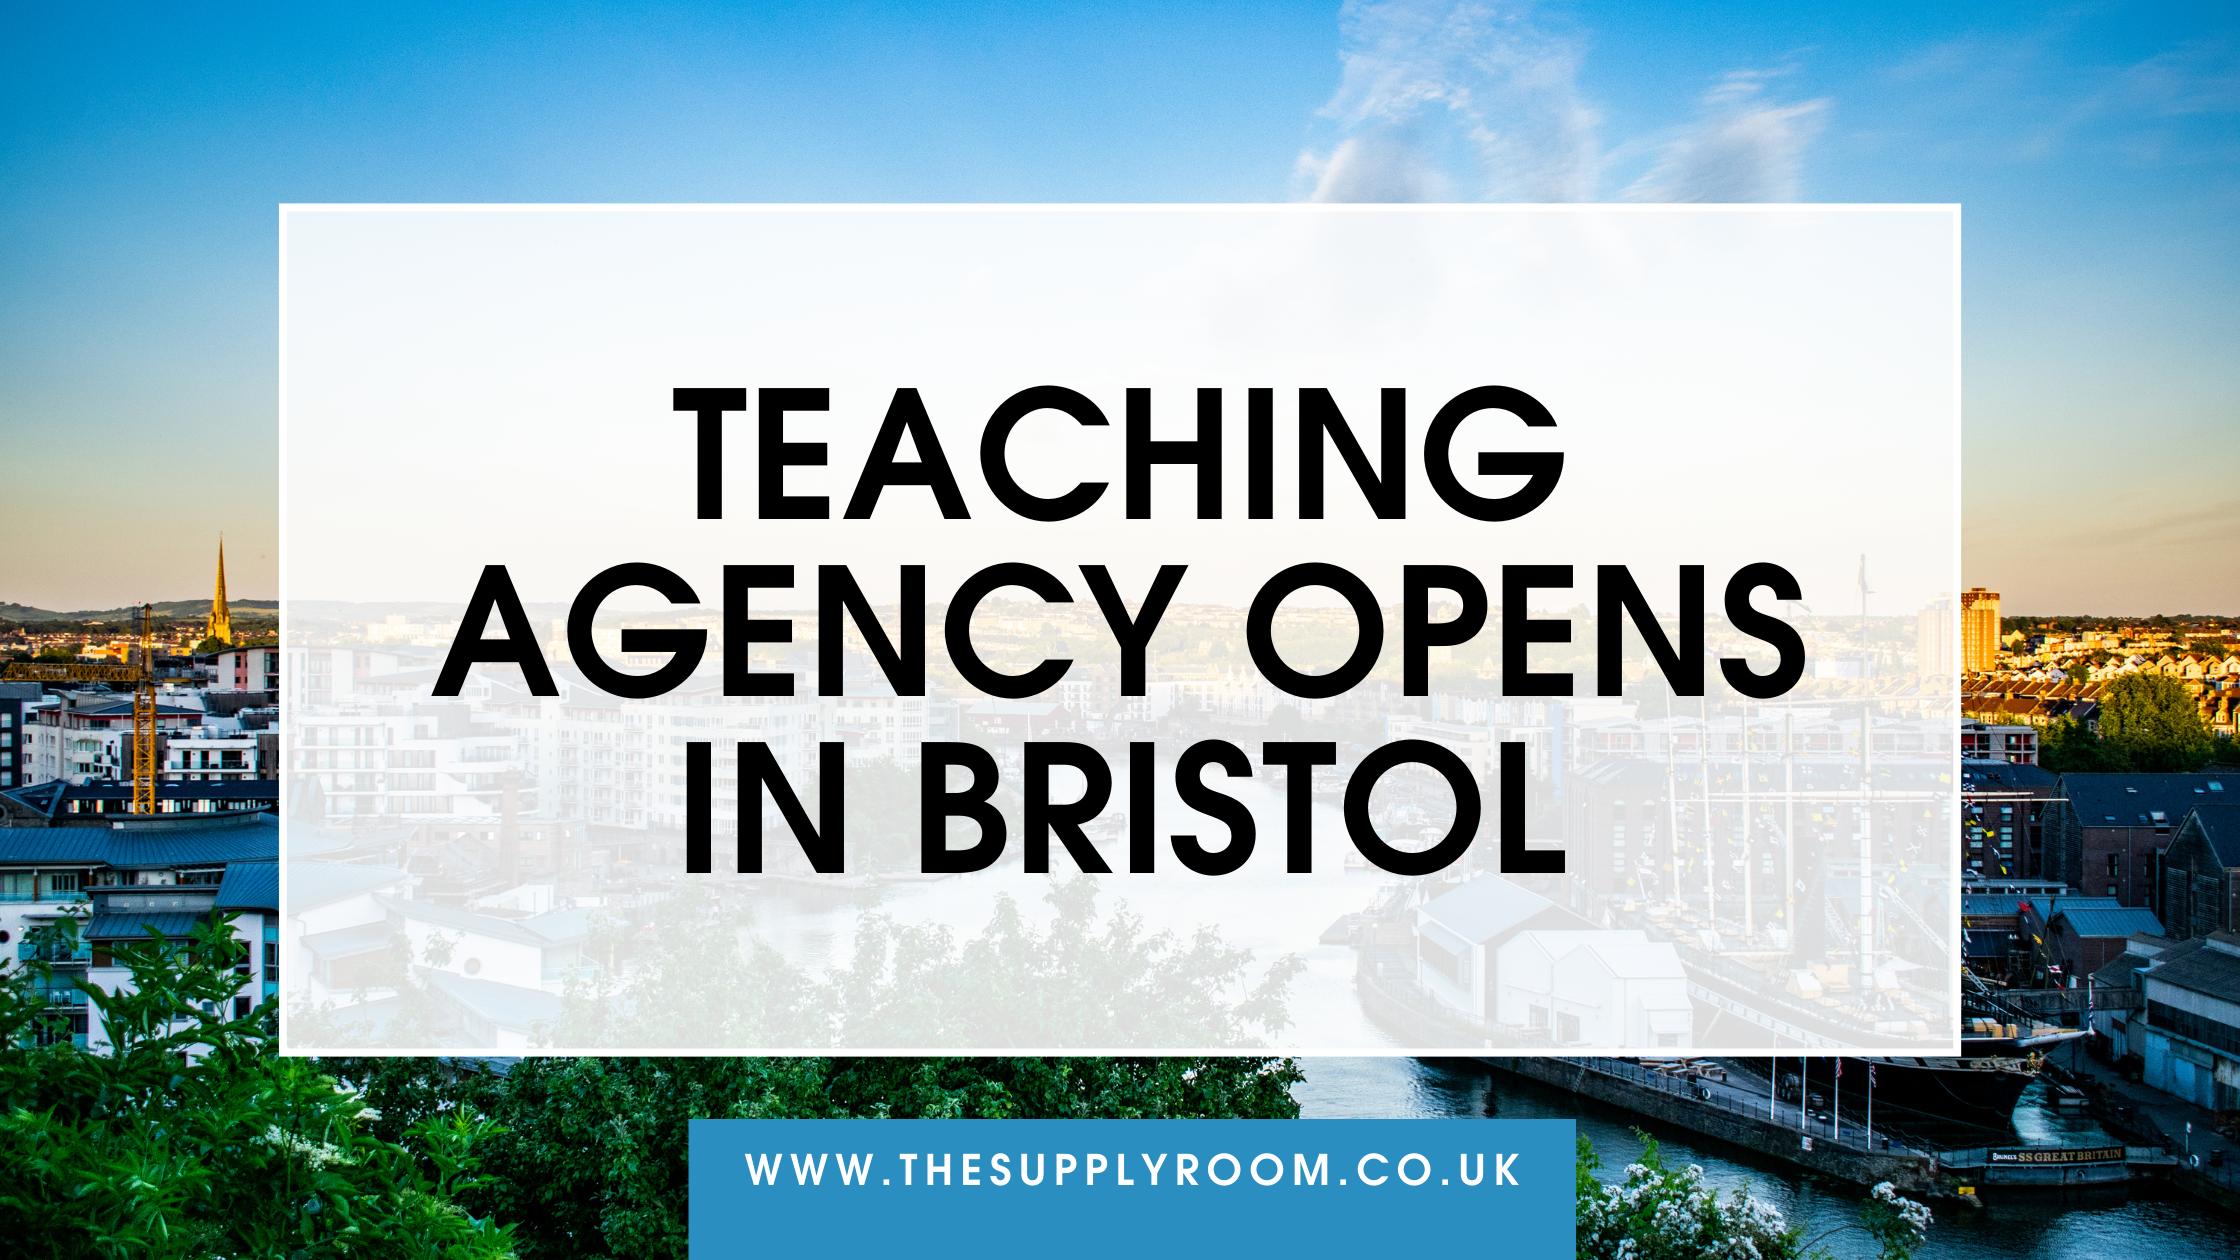 Bristol's newest teaching agency